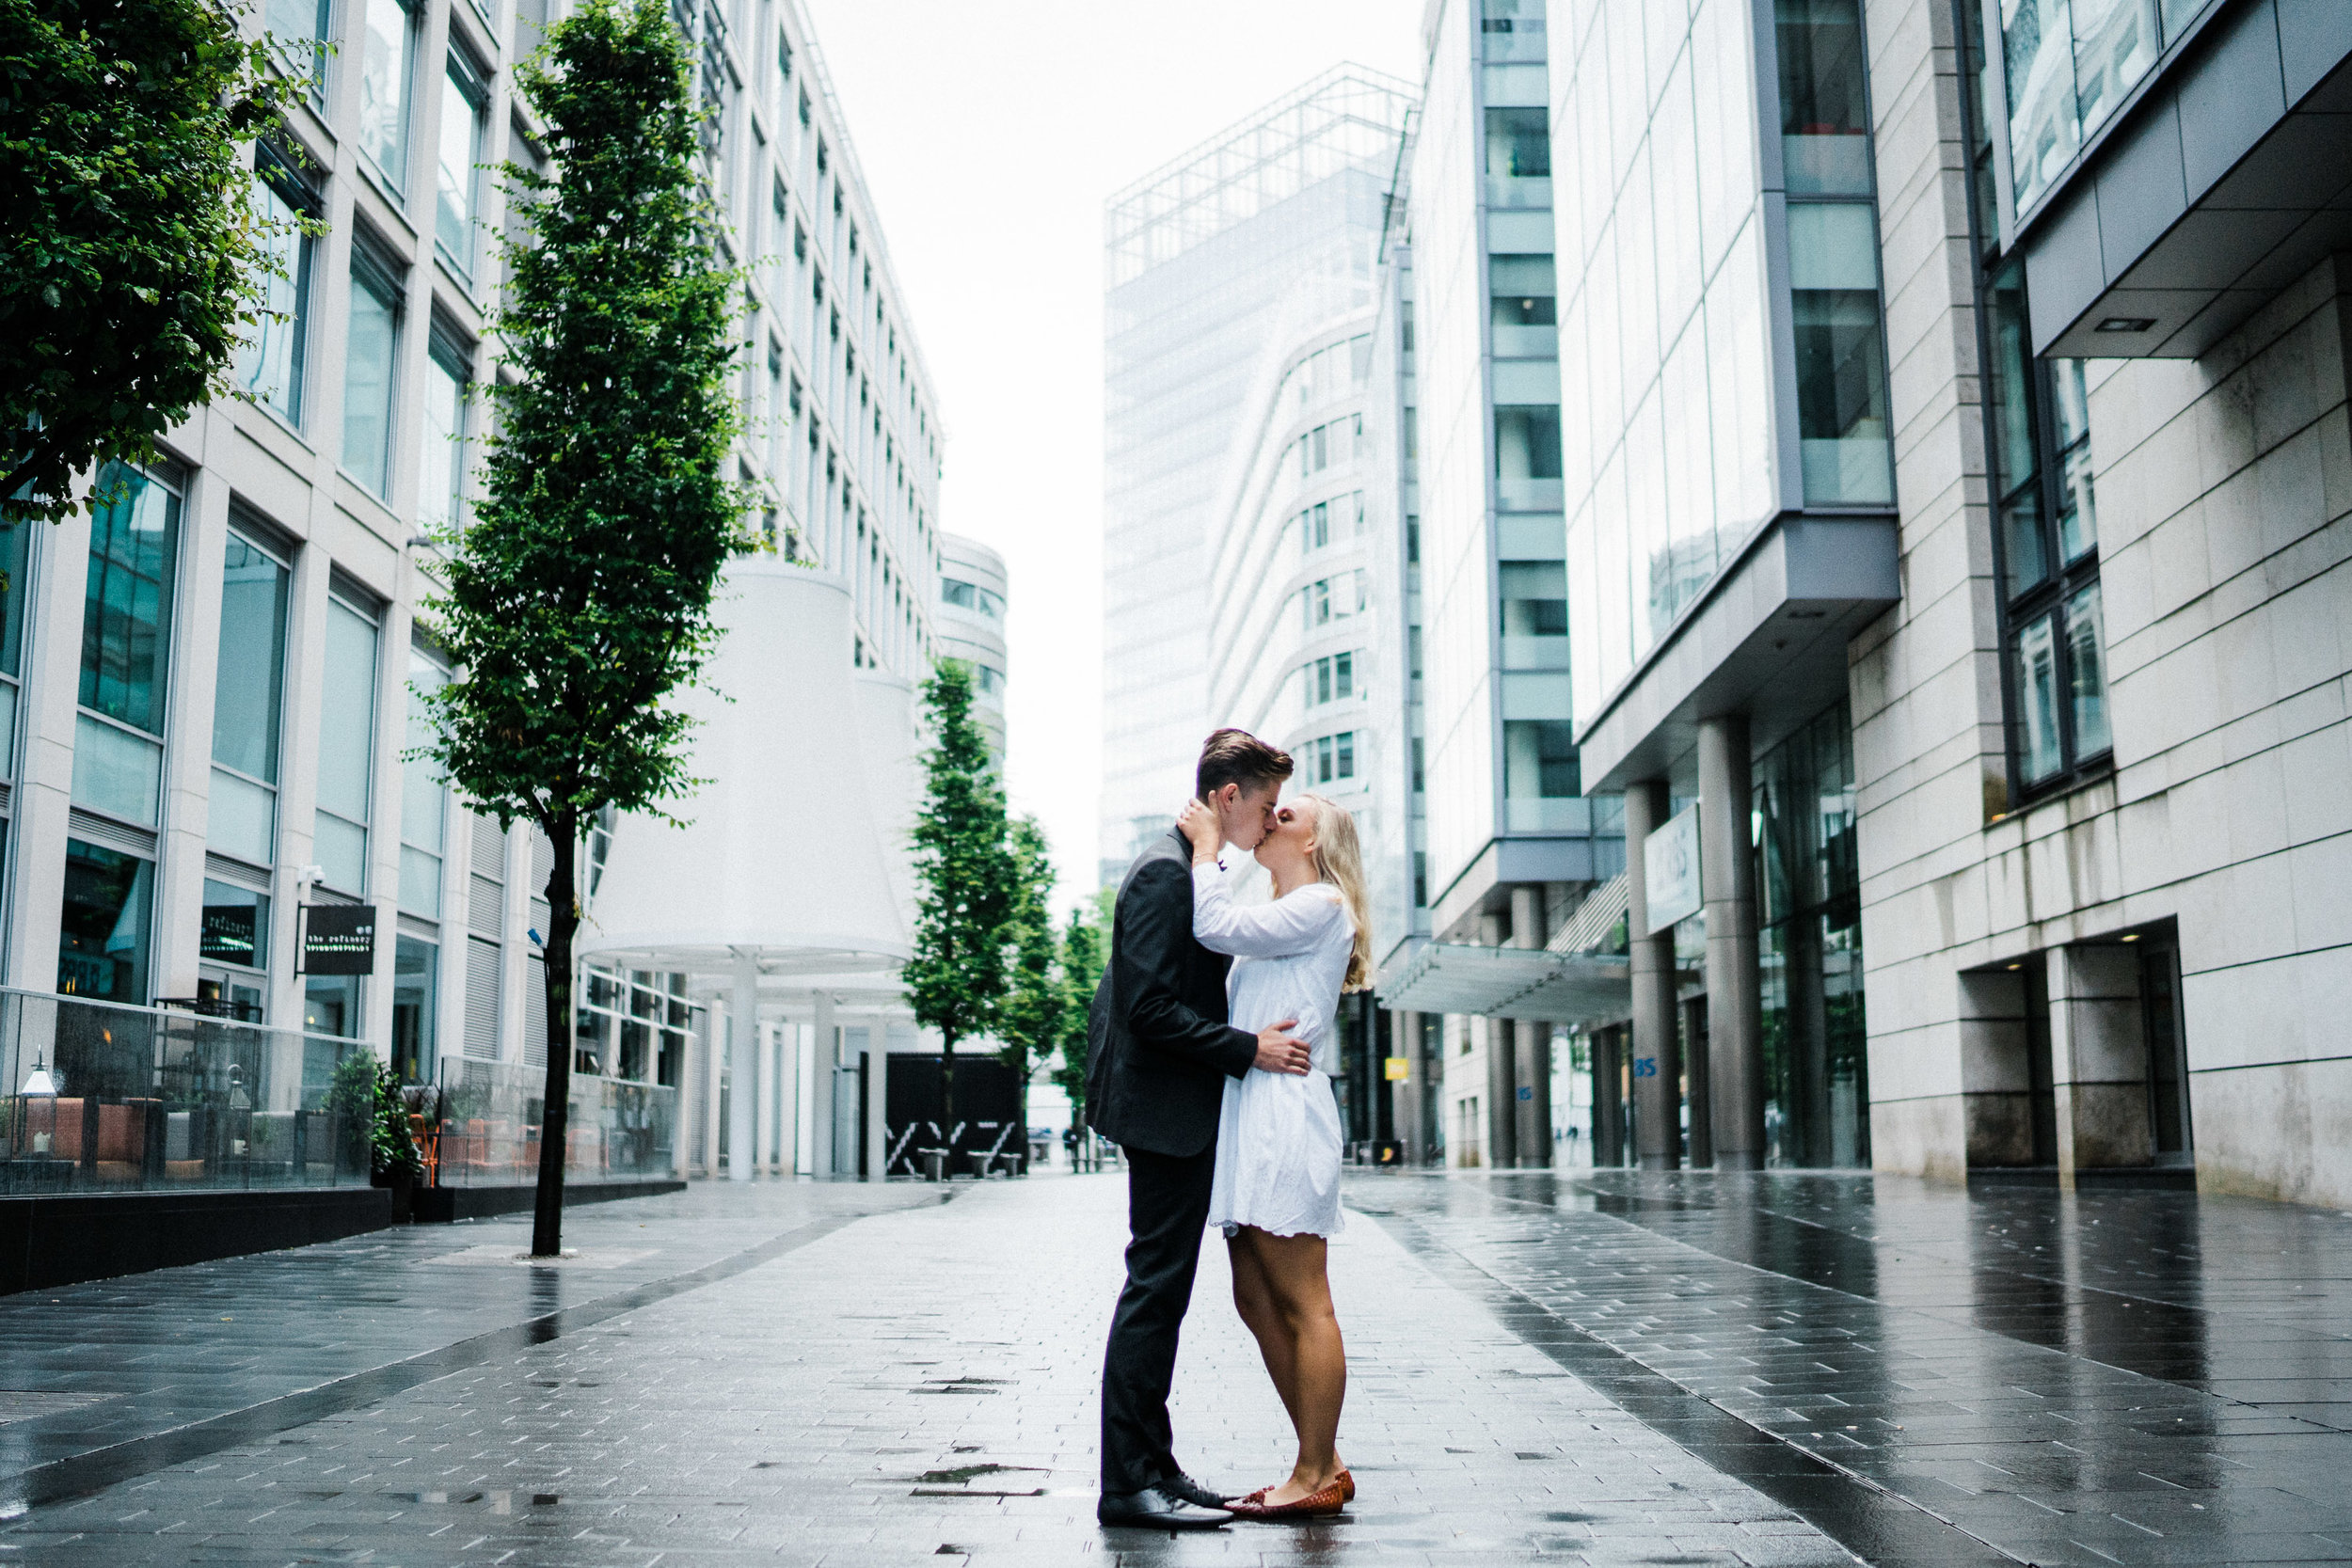 www.bytomw.com - Tom Wright - Manchester & Lake District Wedding Photographer -01030.jpg